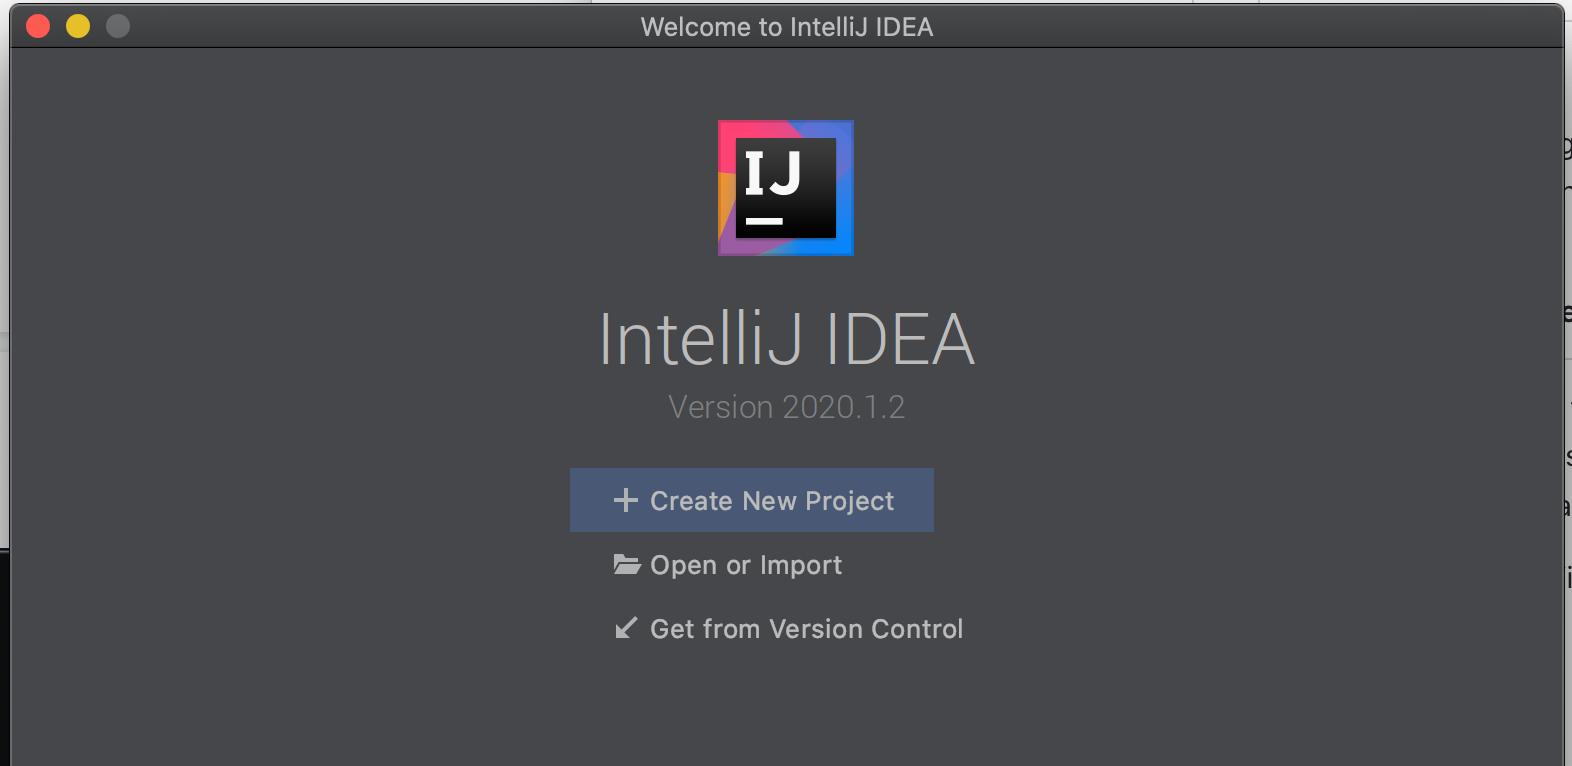 CreateNewProject